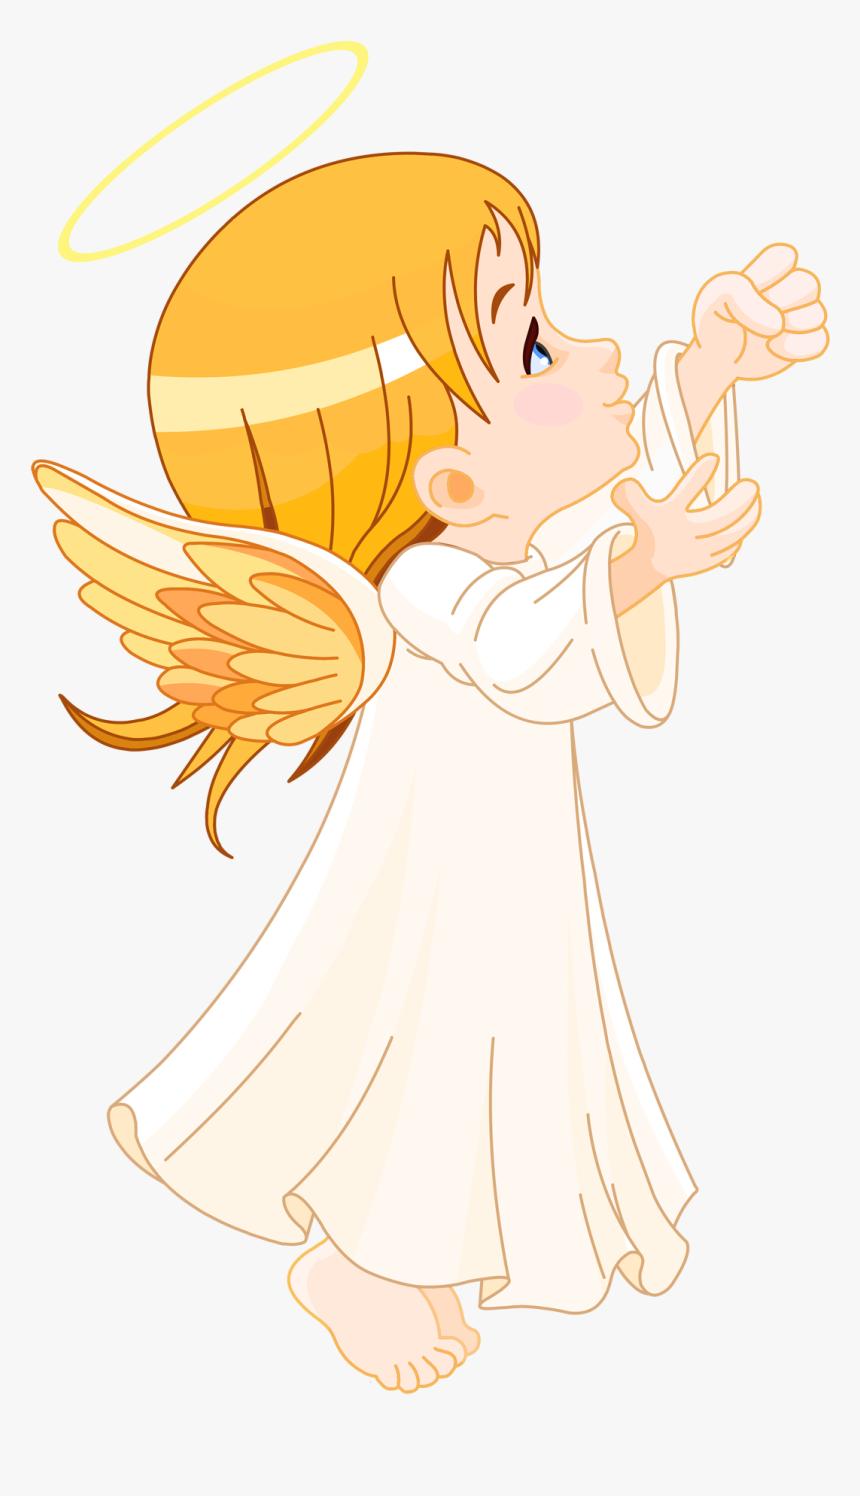 Clipart Angel Transparent Background Baby Angel Png Free Download Png Download Kindpng